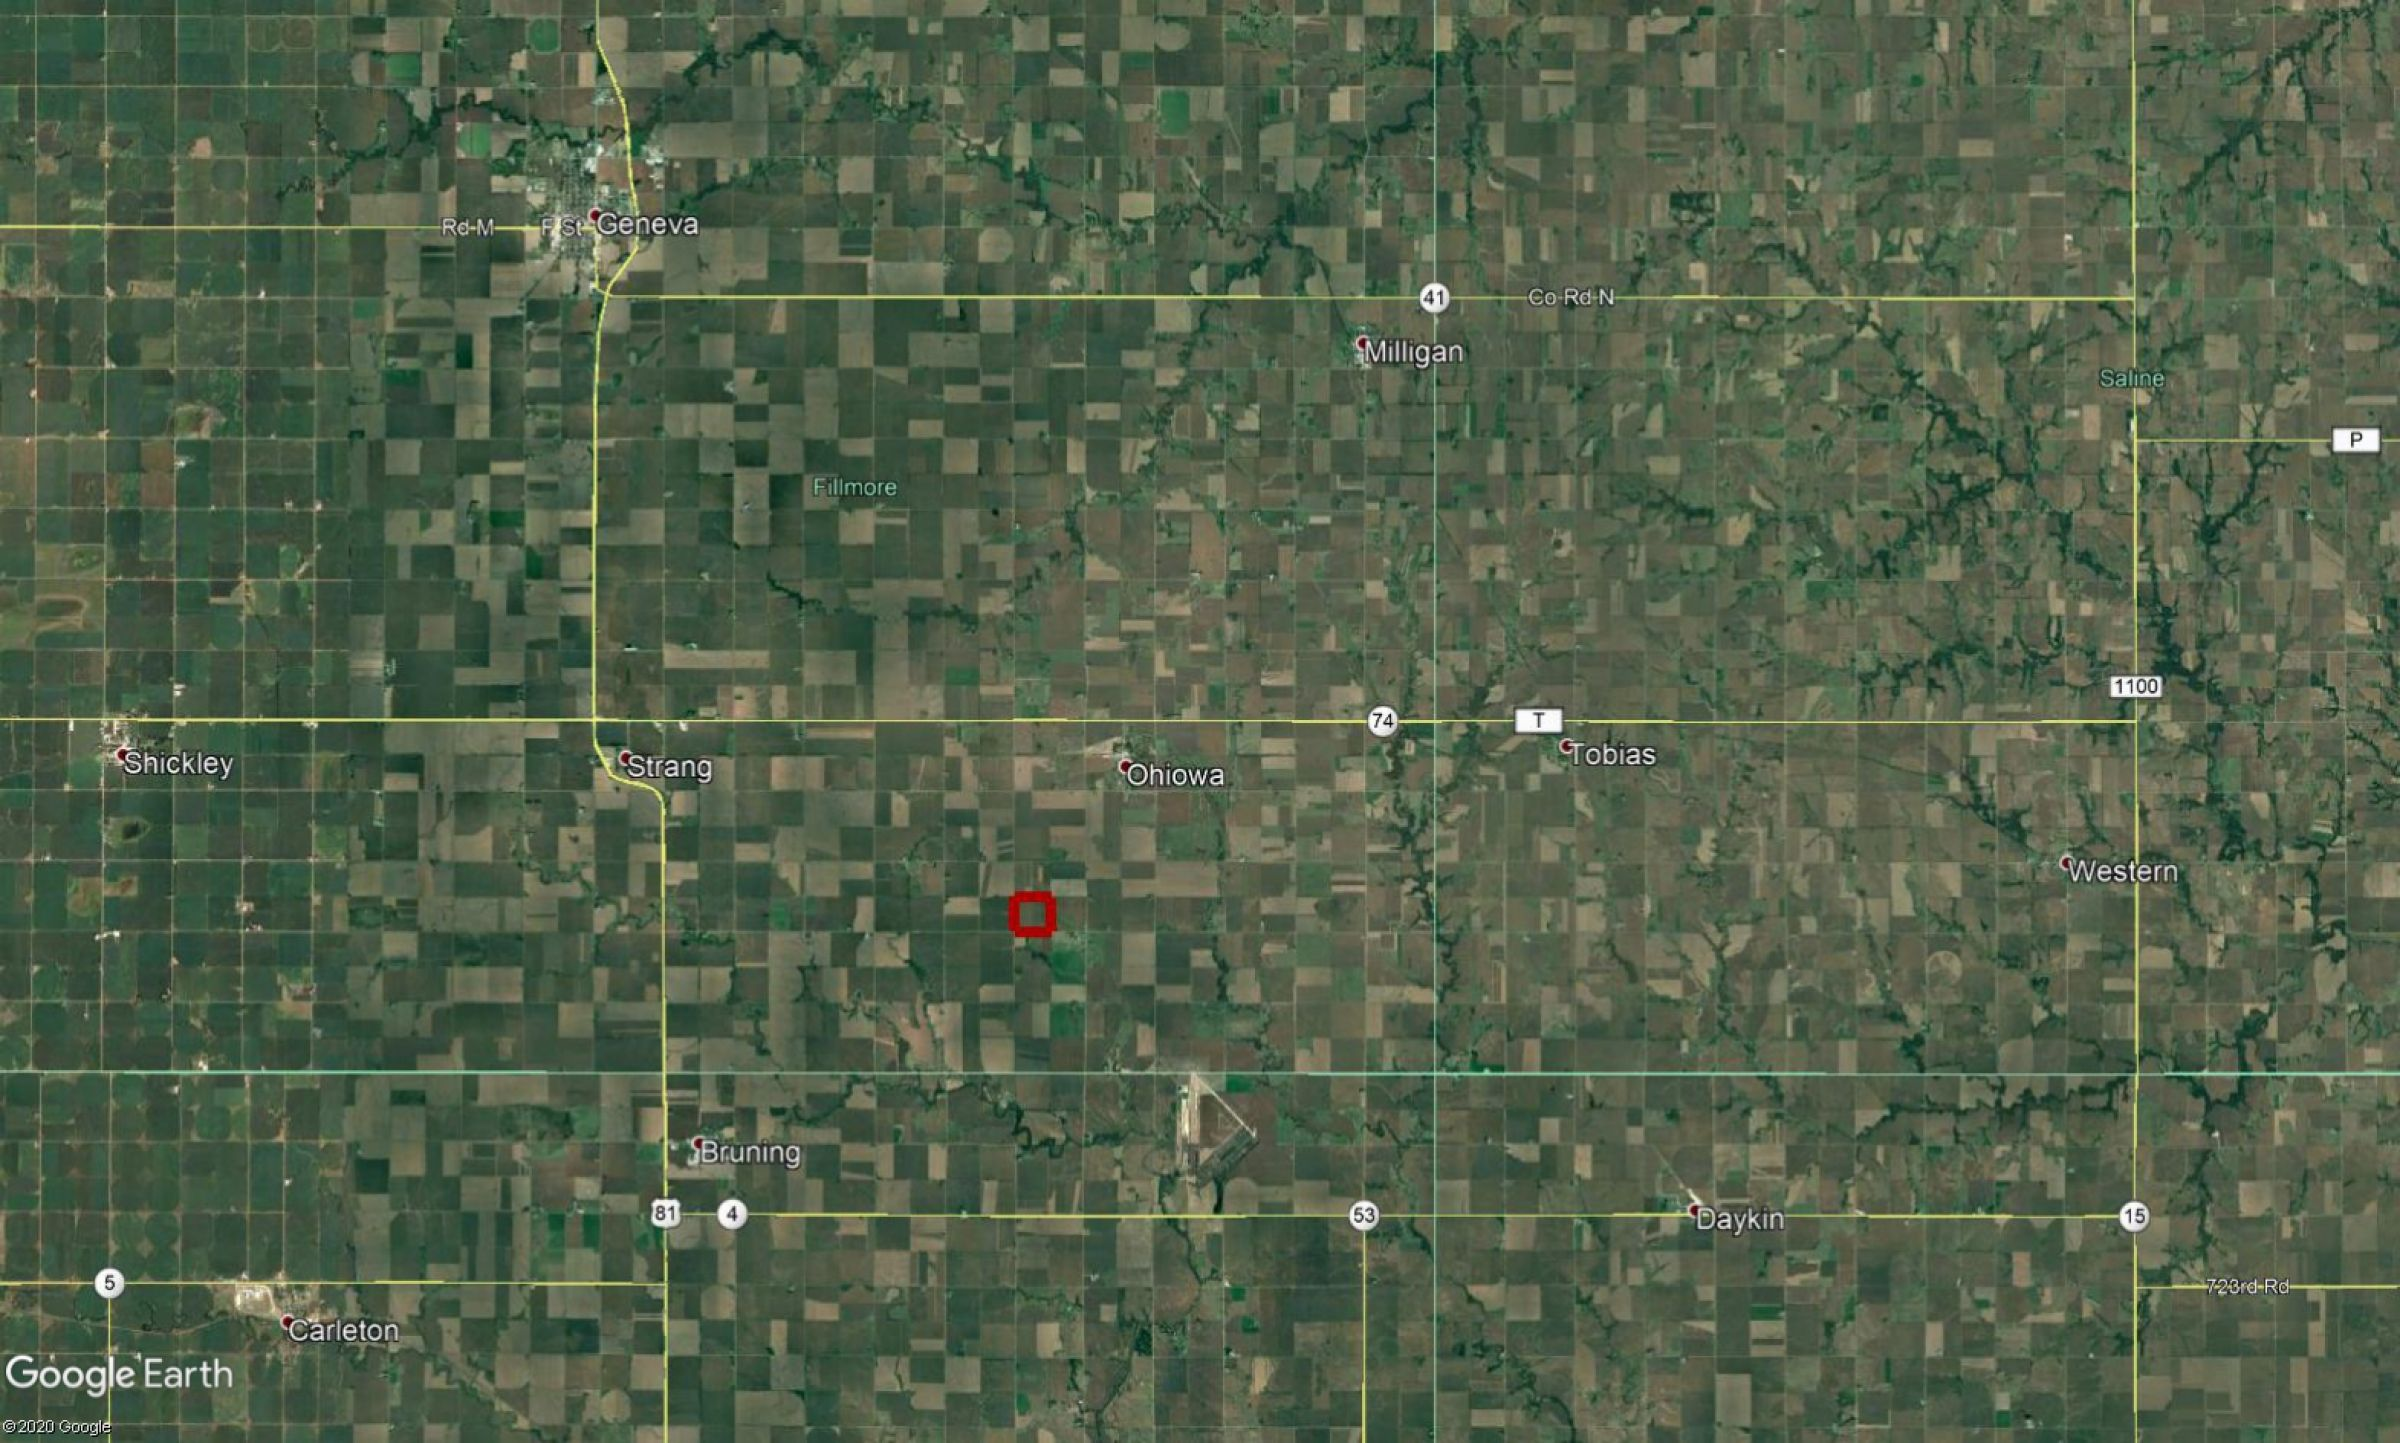 auctions-land-fillmore-county-nebraska-166-acres-listing-number-15330-0-2021-01-27-183446.jpg